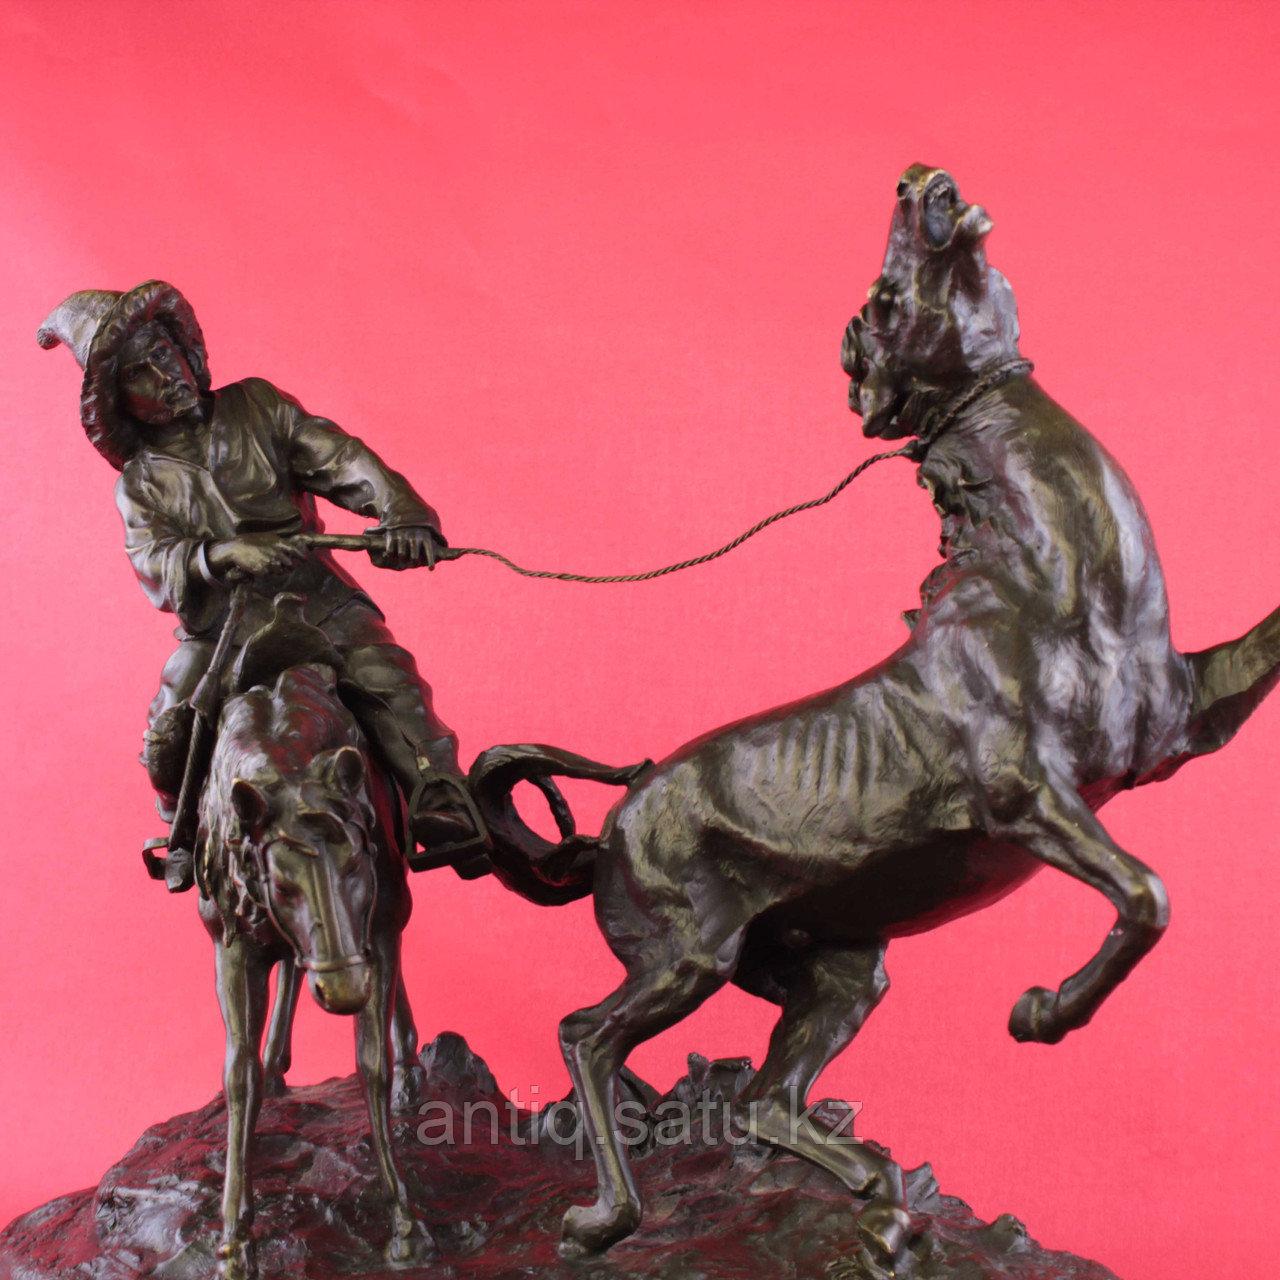 Скульптурная композиция «Ловля дикой лошади» По модели Е.А. Лансере (1848-1886) - фото 3